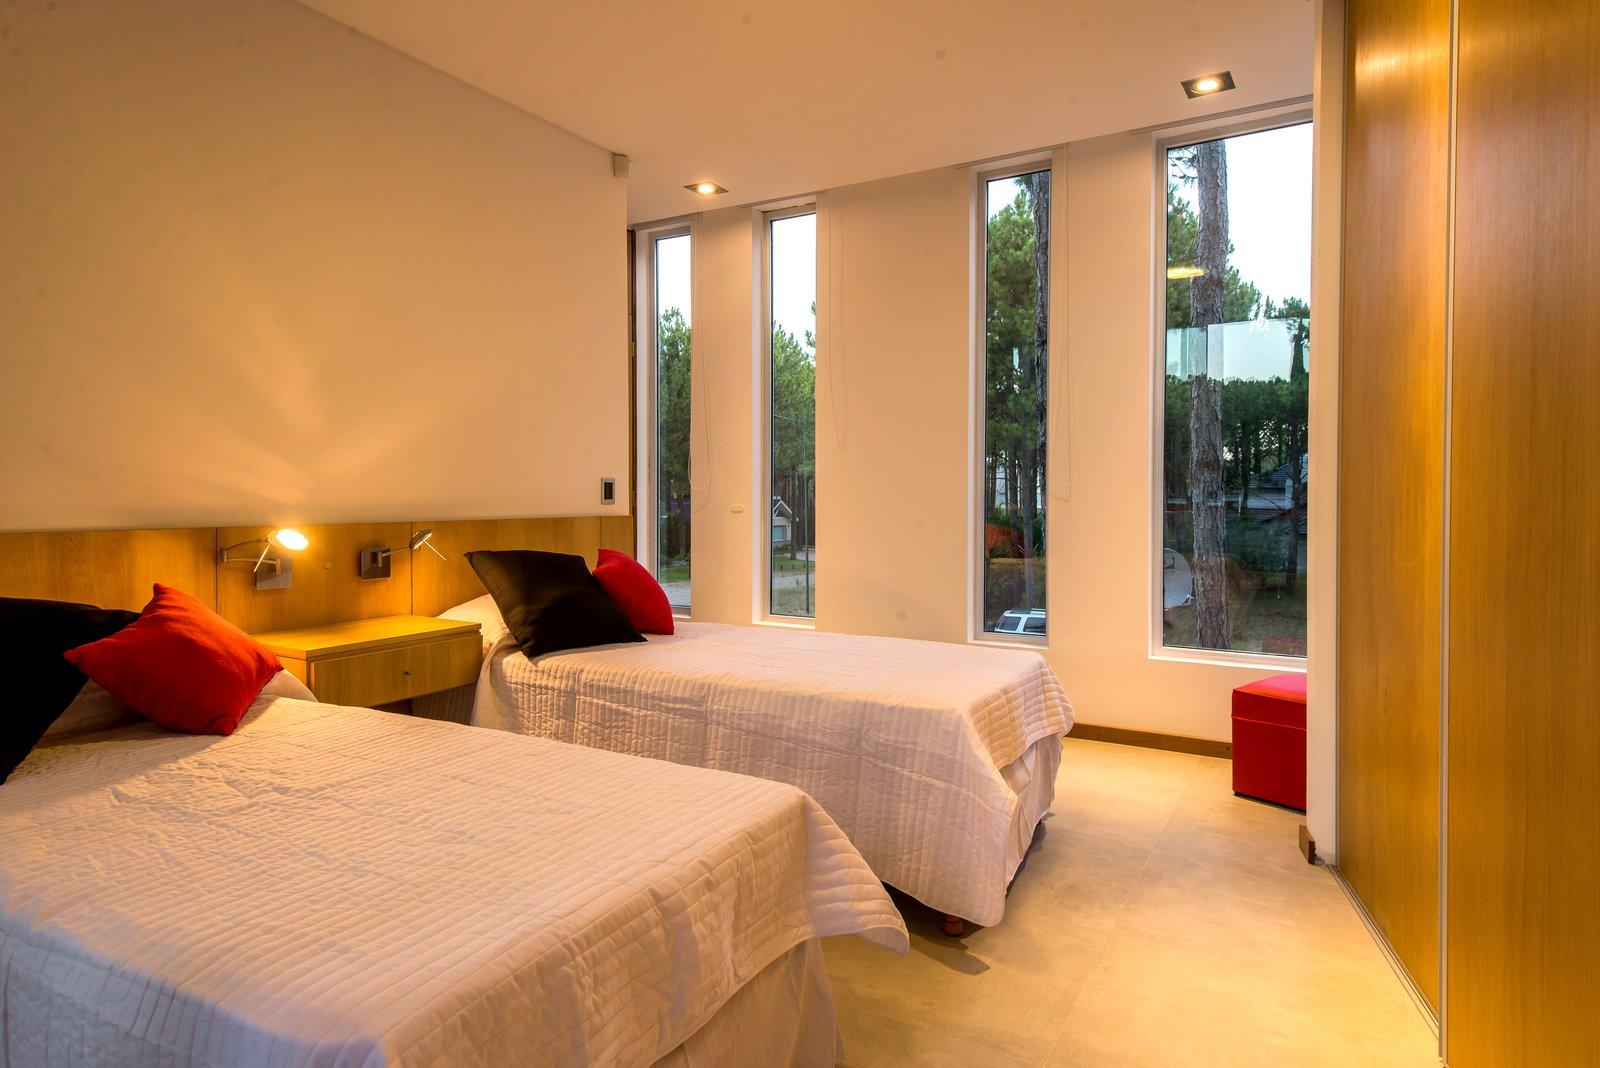 Bedroom, Night Stands, Porcelain Tile Floor, Ceiling Lighting, Wall Lighting, Bed, and Storage  Casa Batin by Estudio Galera